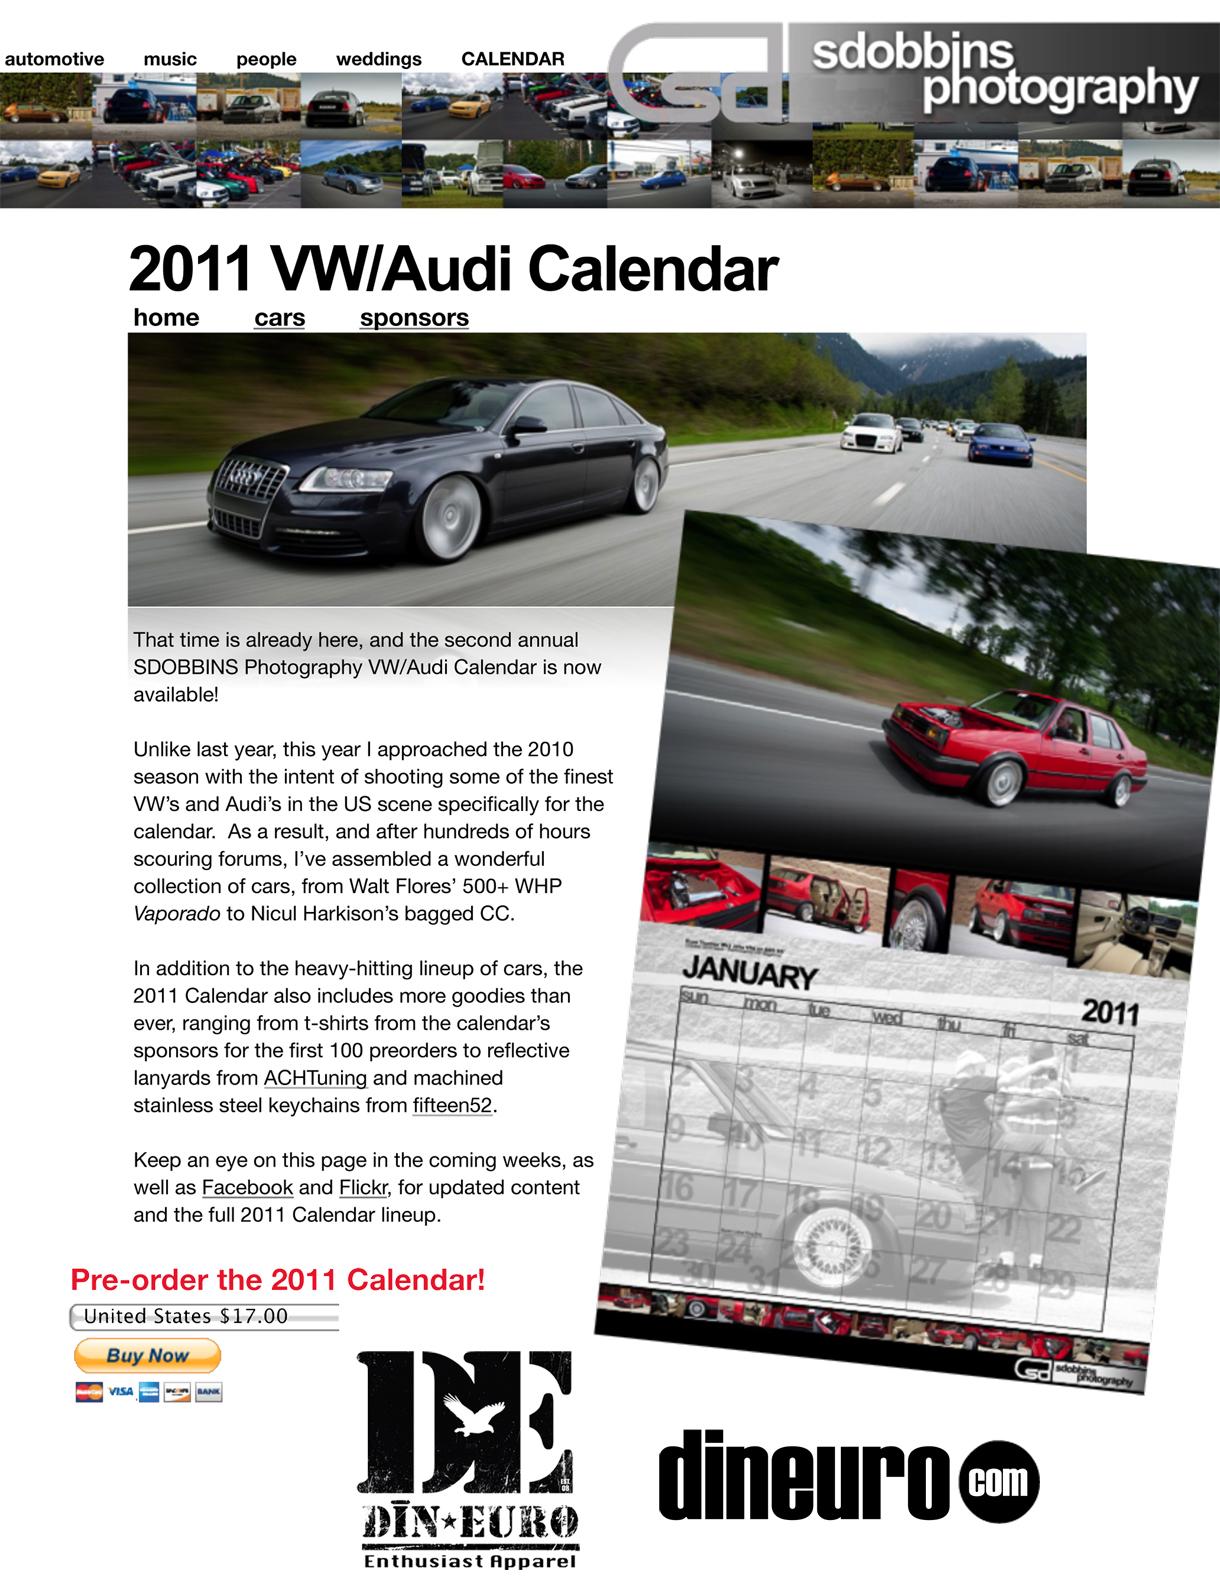 http://2.bp.blogspot.com/_5wlo8dy87Hk/TJwcTKrcPiI/AAAAAAAAAG4/DDWxhoI_iTQ/s1600/sdobbins_calendar_post_FBB.jpg